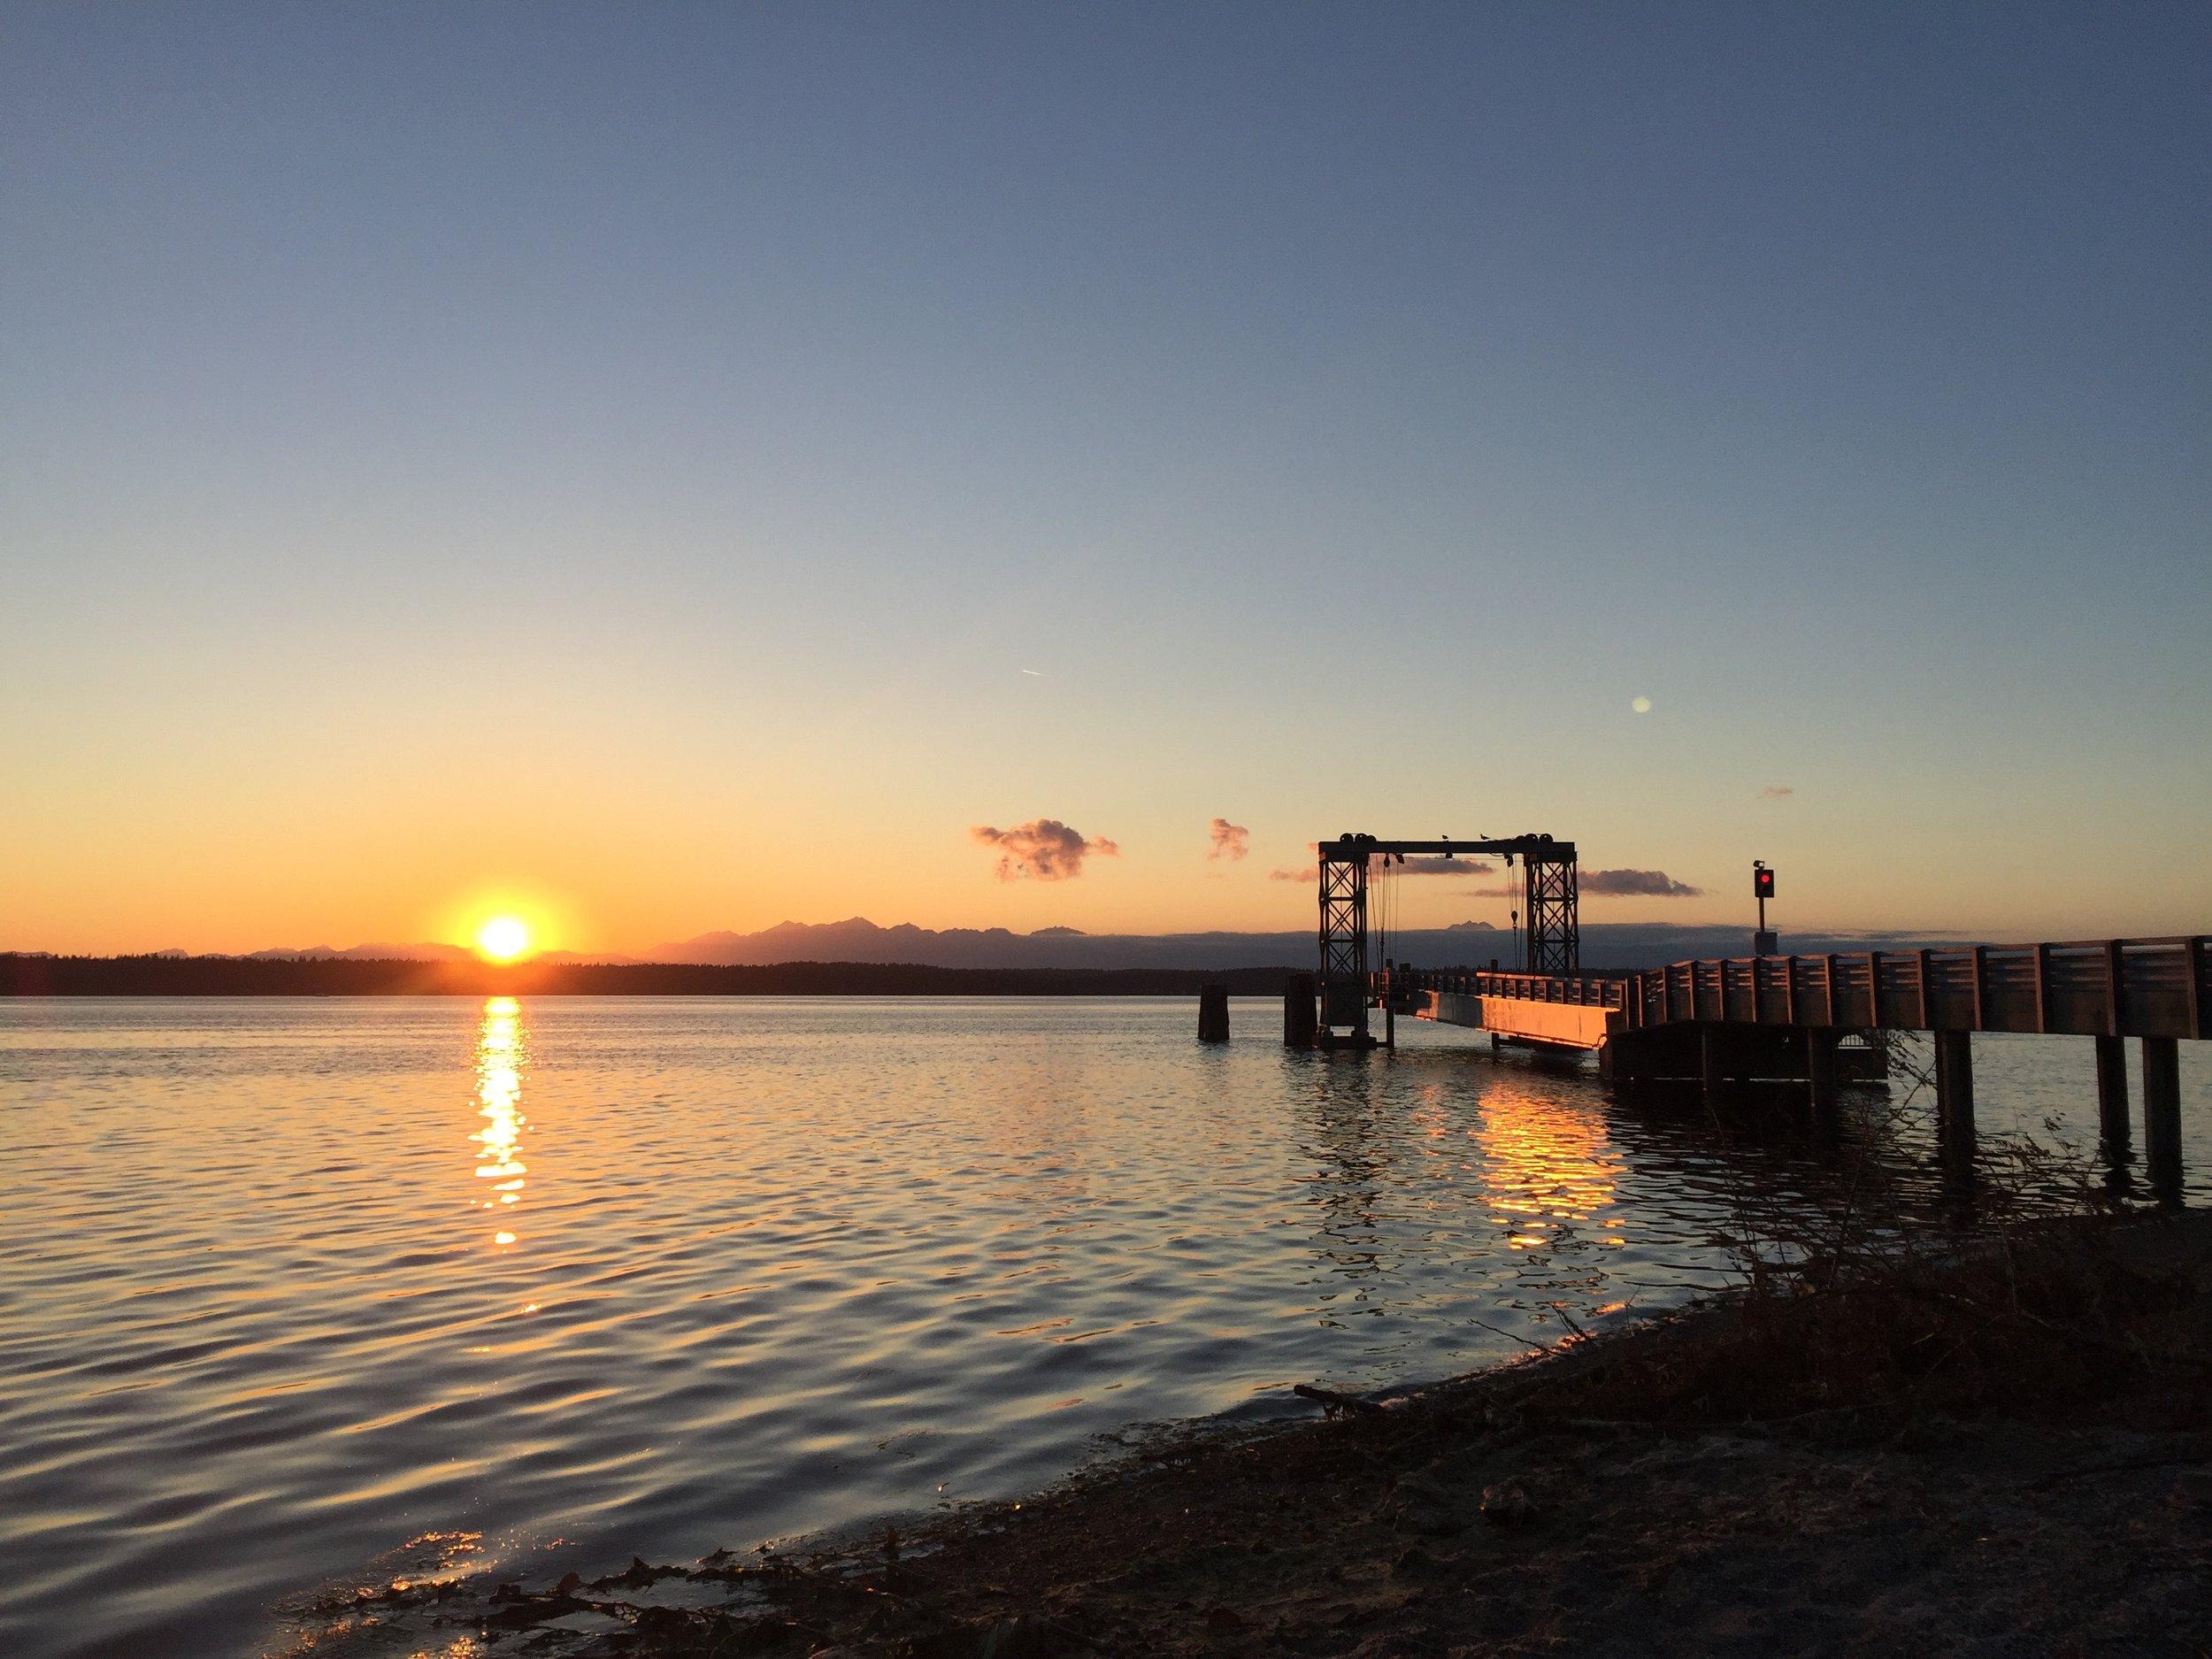 Herron Island Ferry Dock